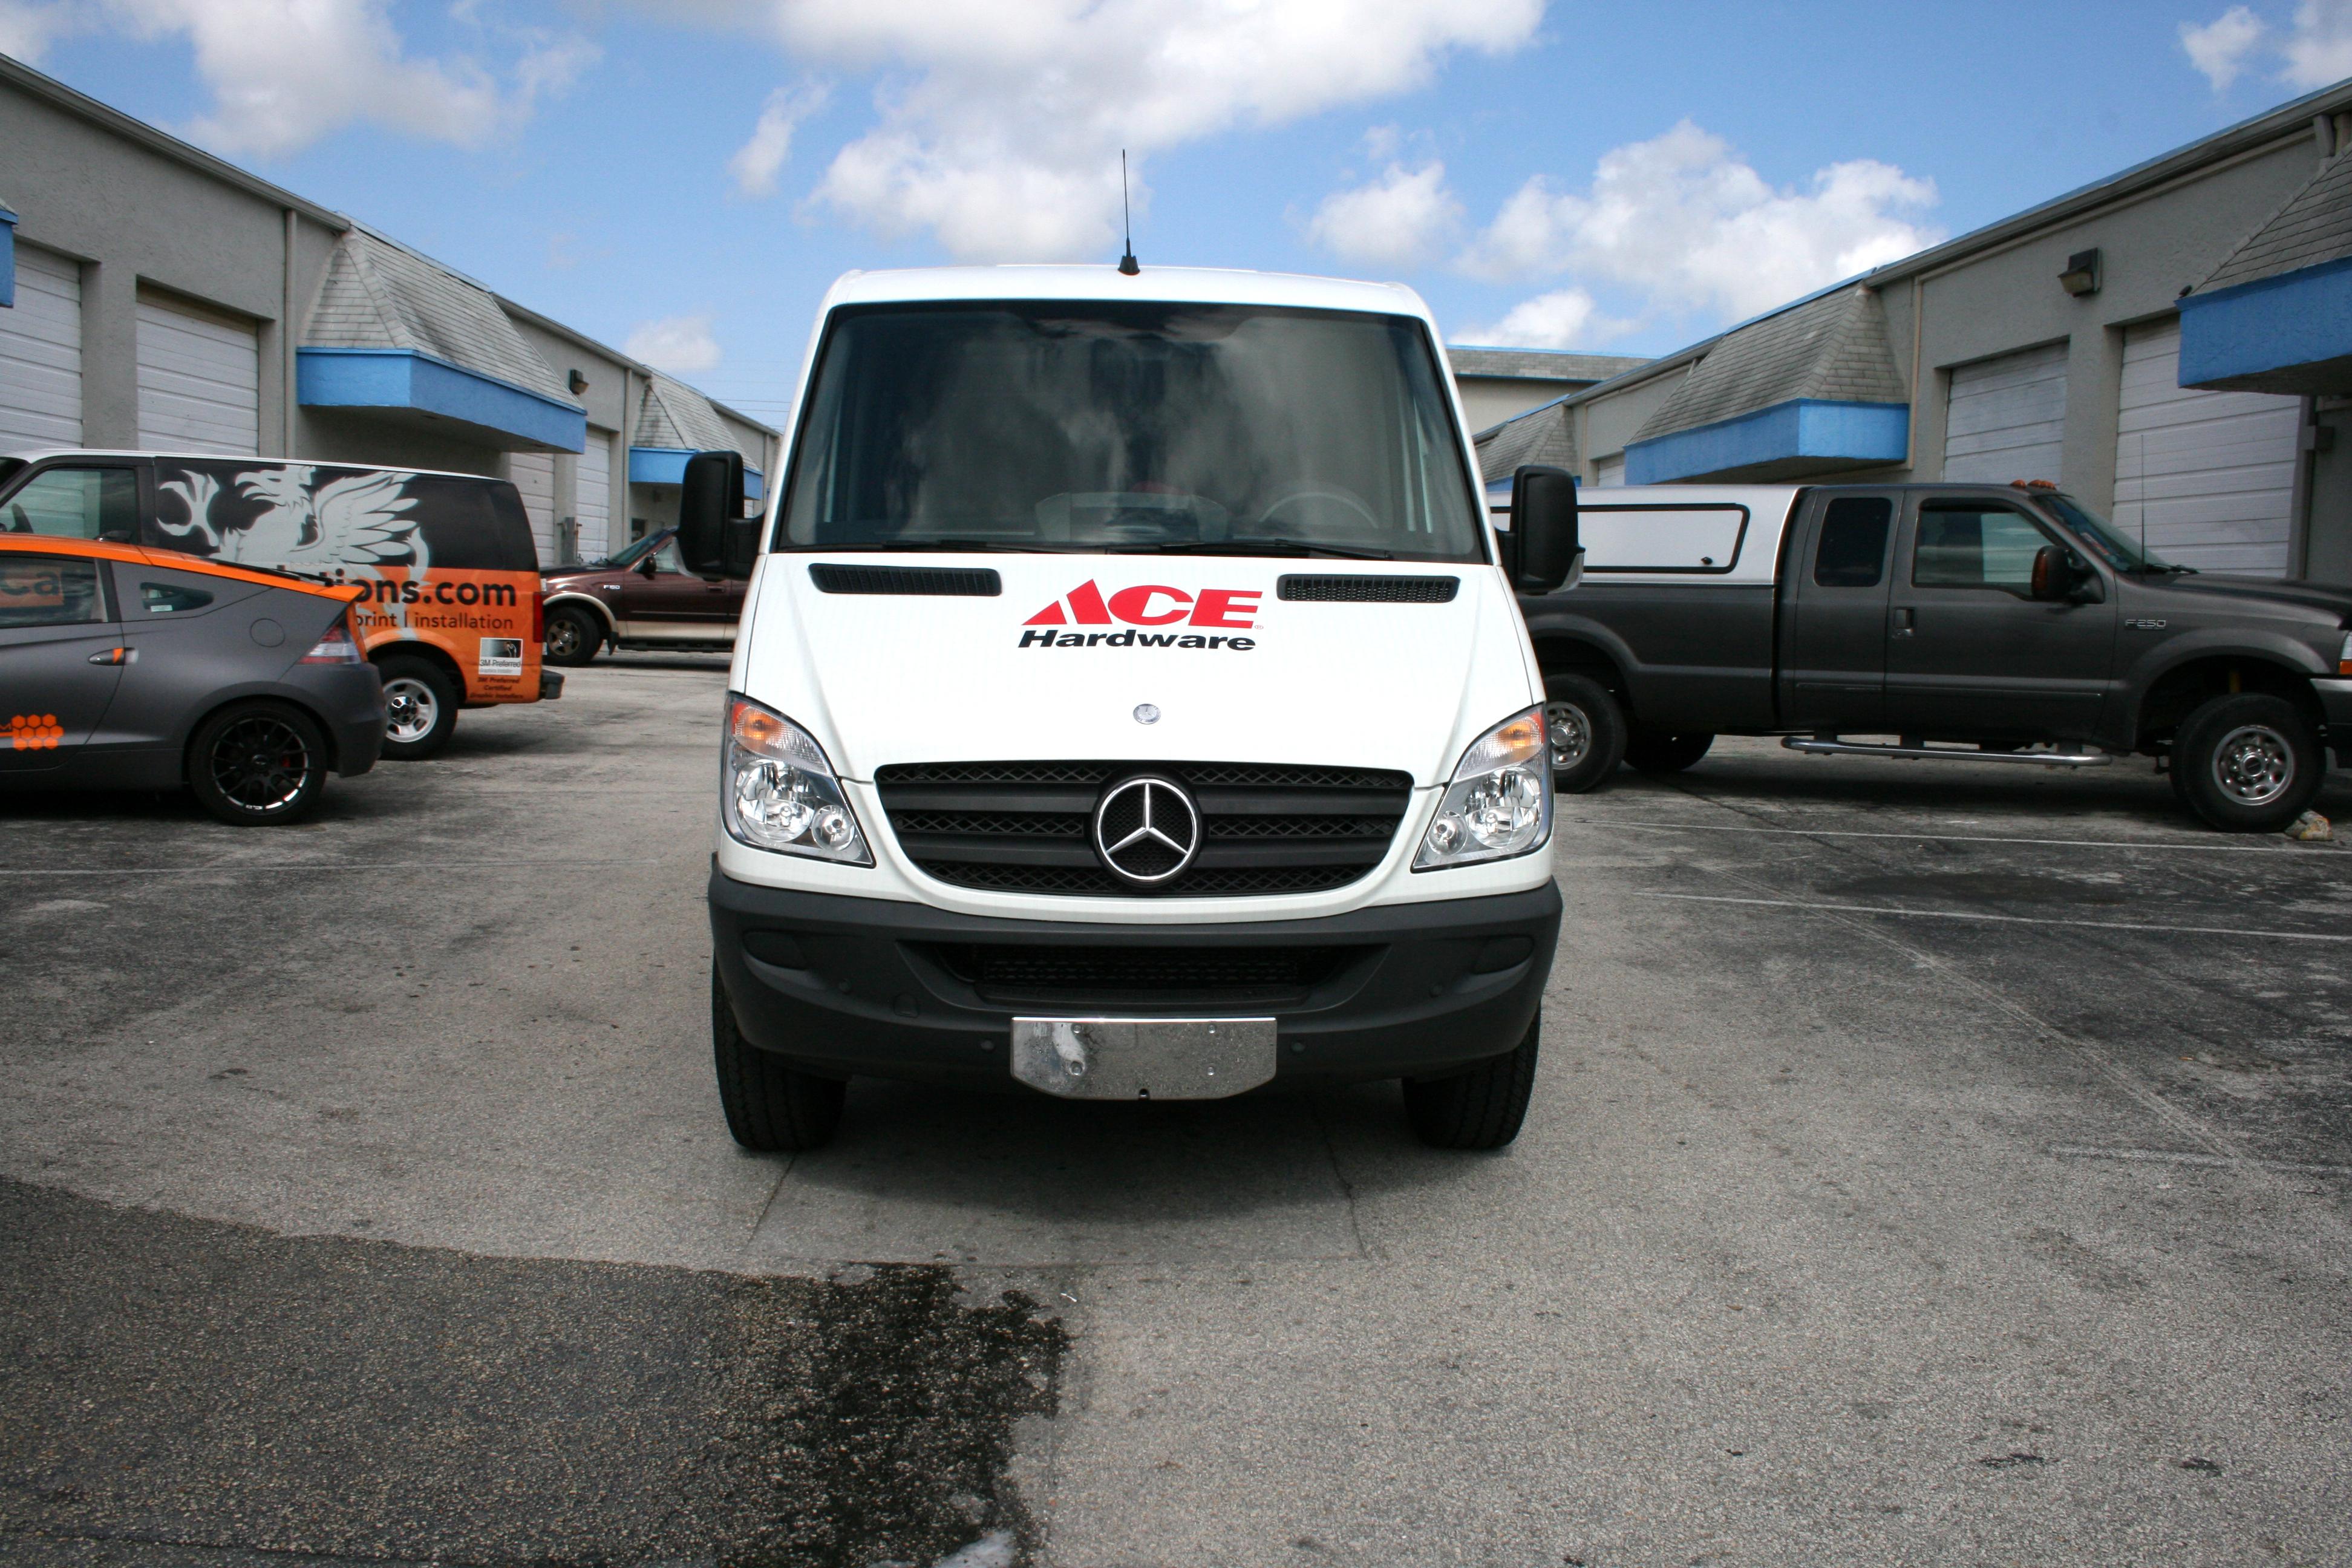 Sprinter Van Wrap Fort Lauderdale Florida Ace Hardware